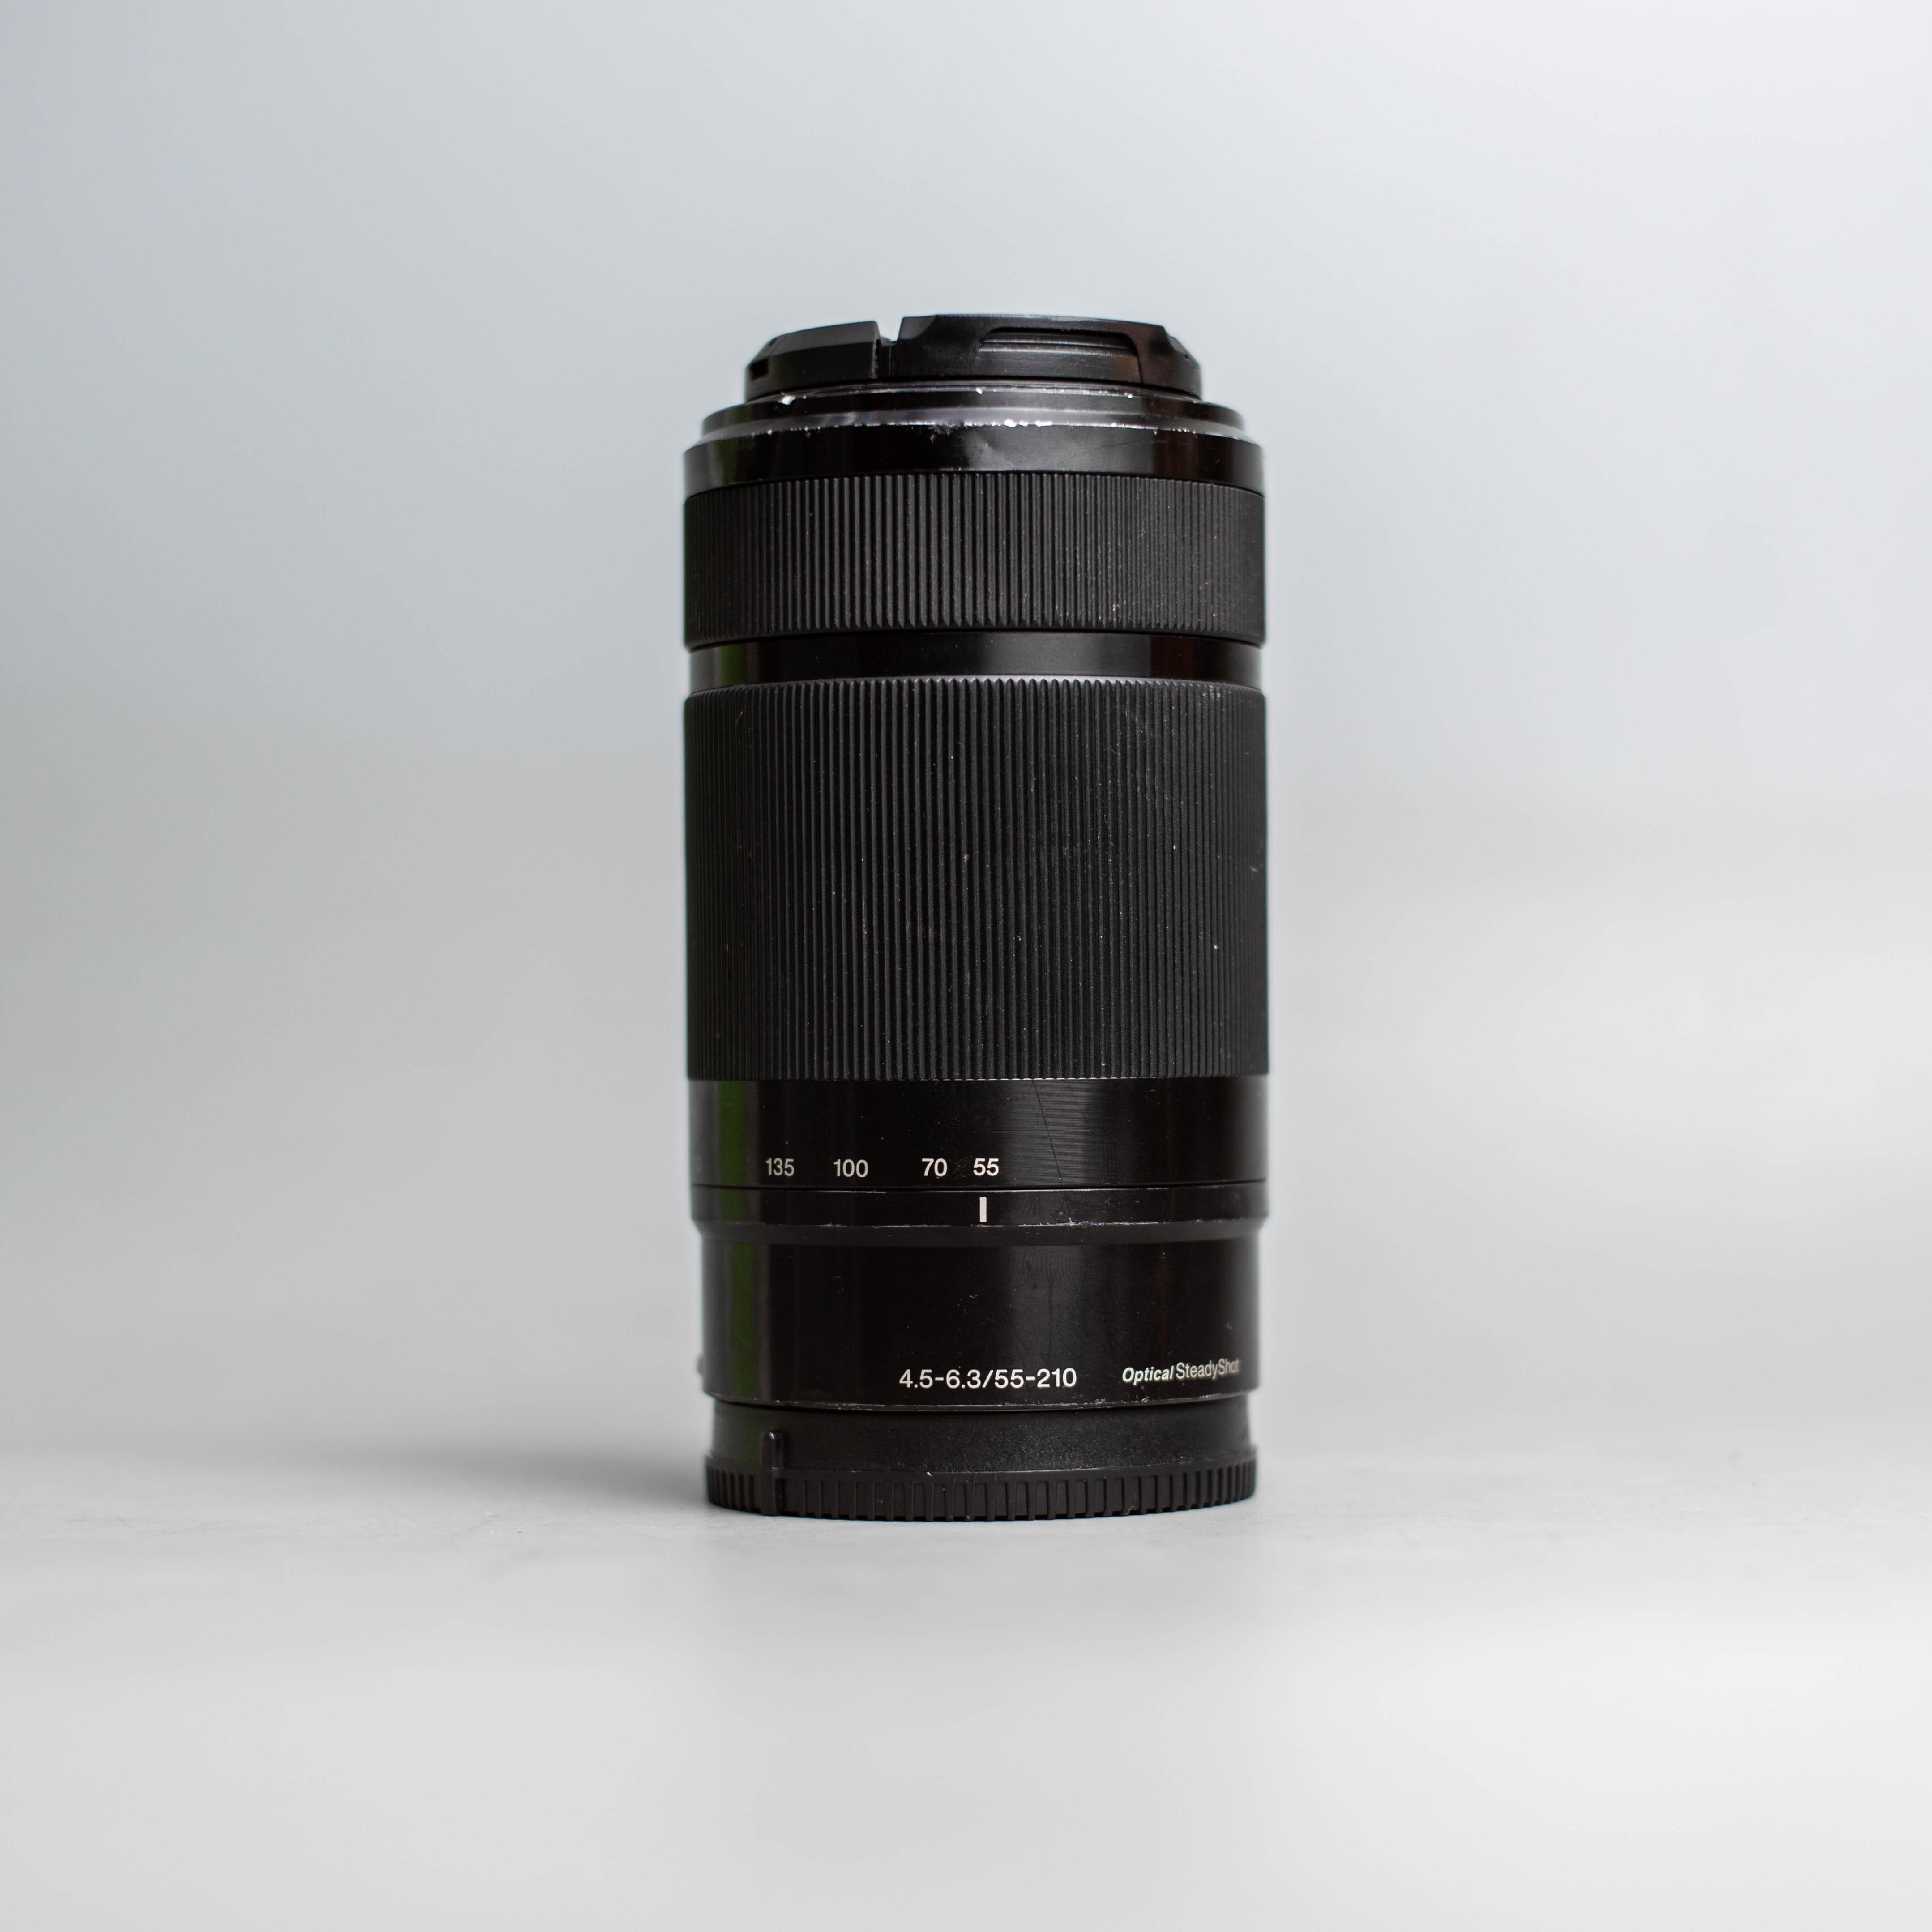 sony-55-210mm-f4-5-6-3-sel-af-oss-55-210-18732